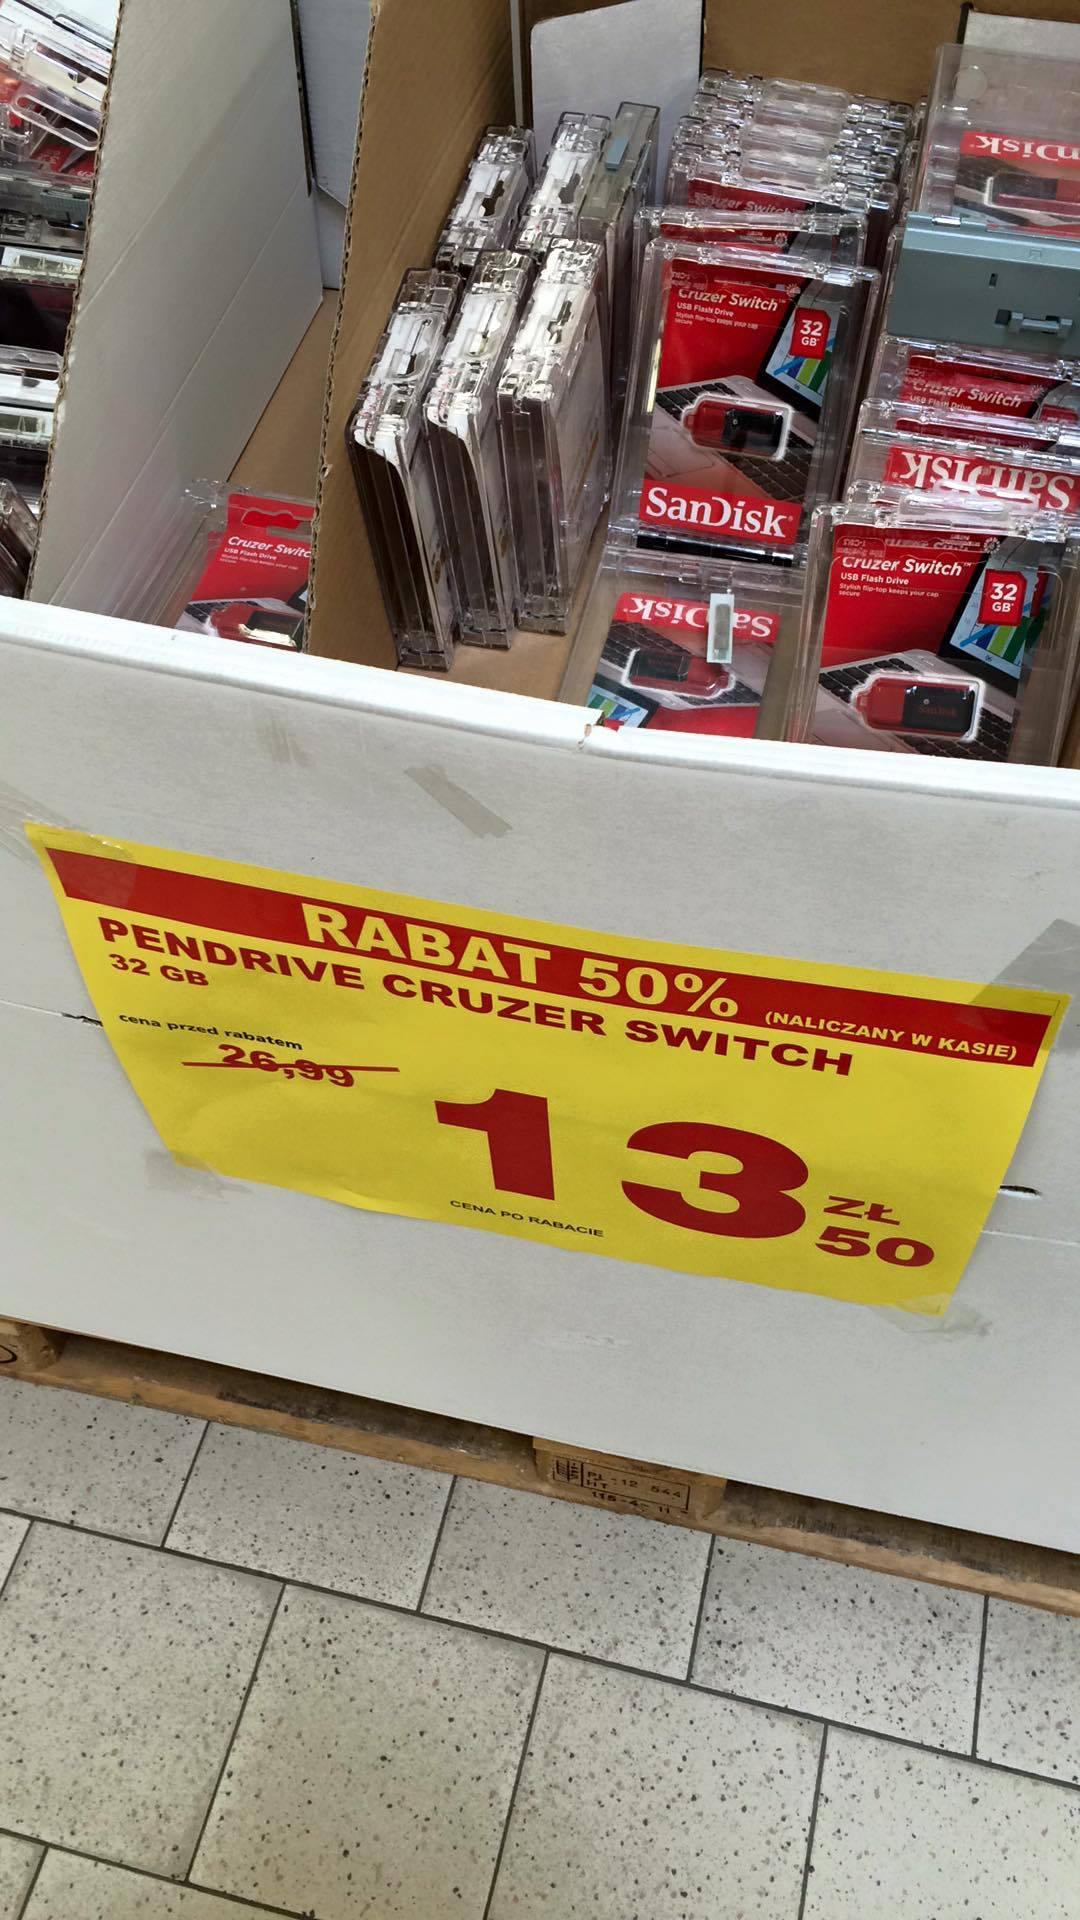 Pendrive USB 2.0 SanDisk Cruzer Switch 32GB @ Auchan (Warszawa)